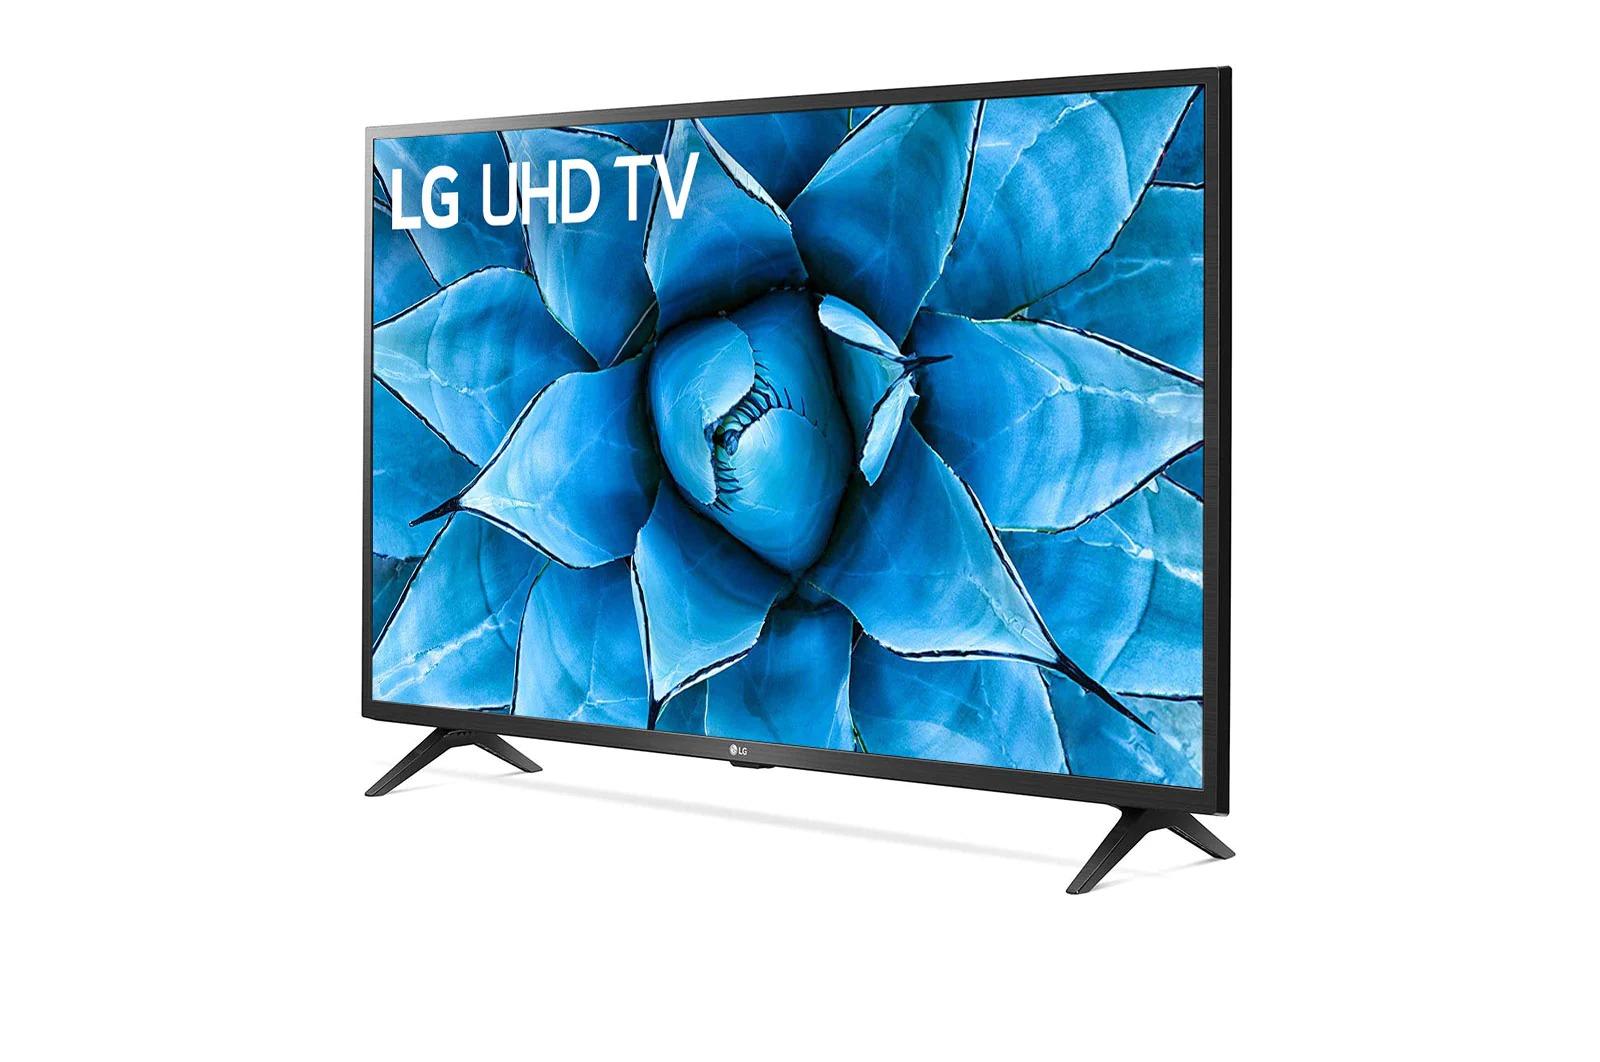 LG (43UN7300PTC) 43 (109cm) 4K SMART UHD TV